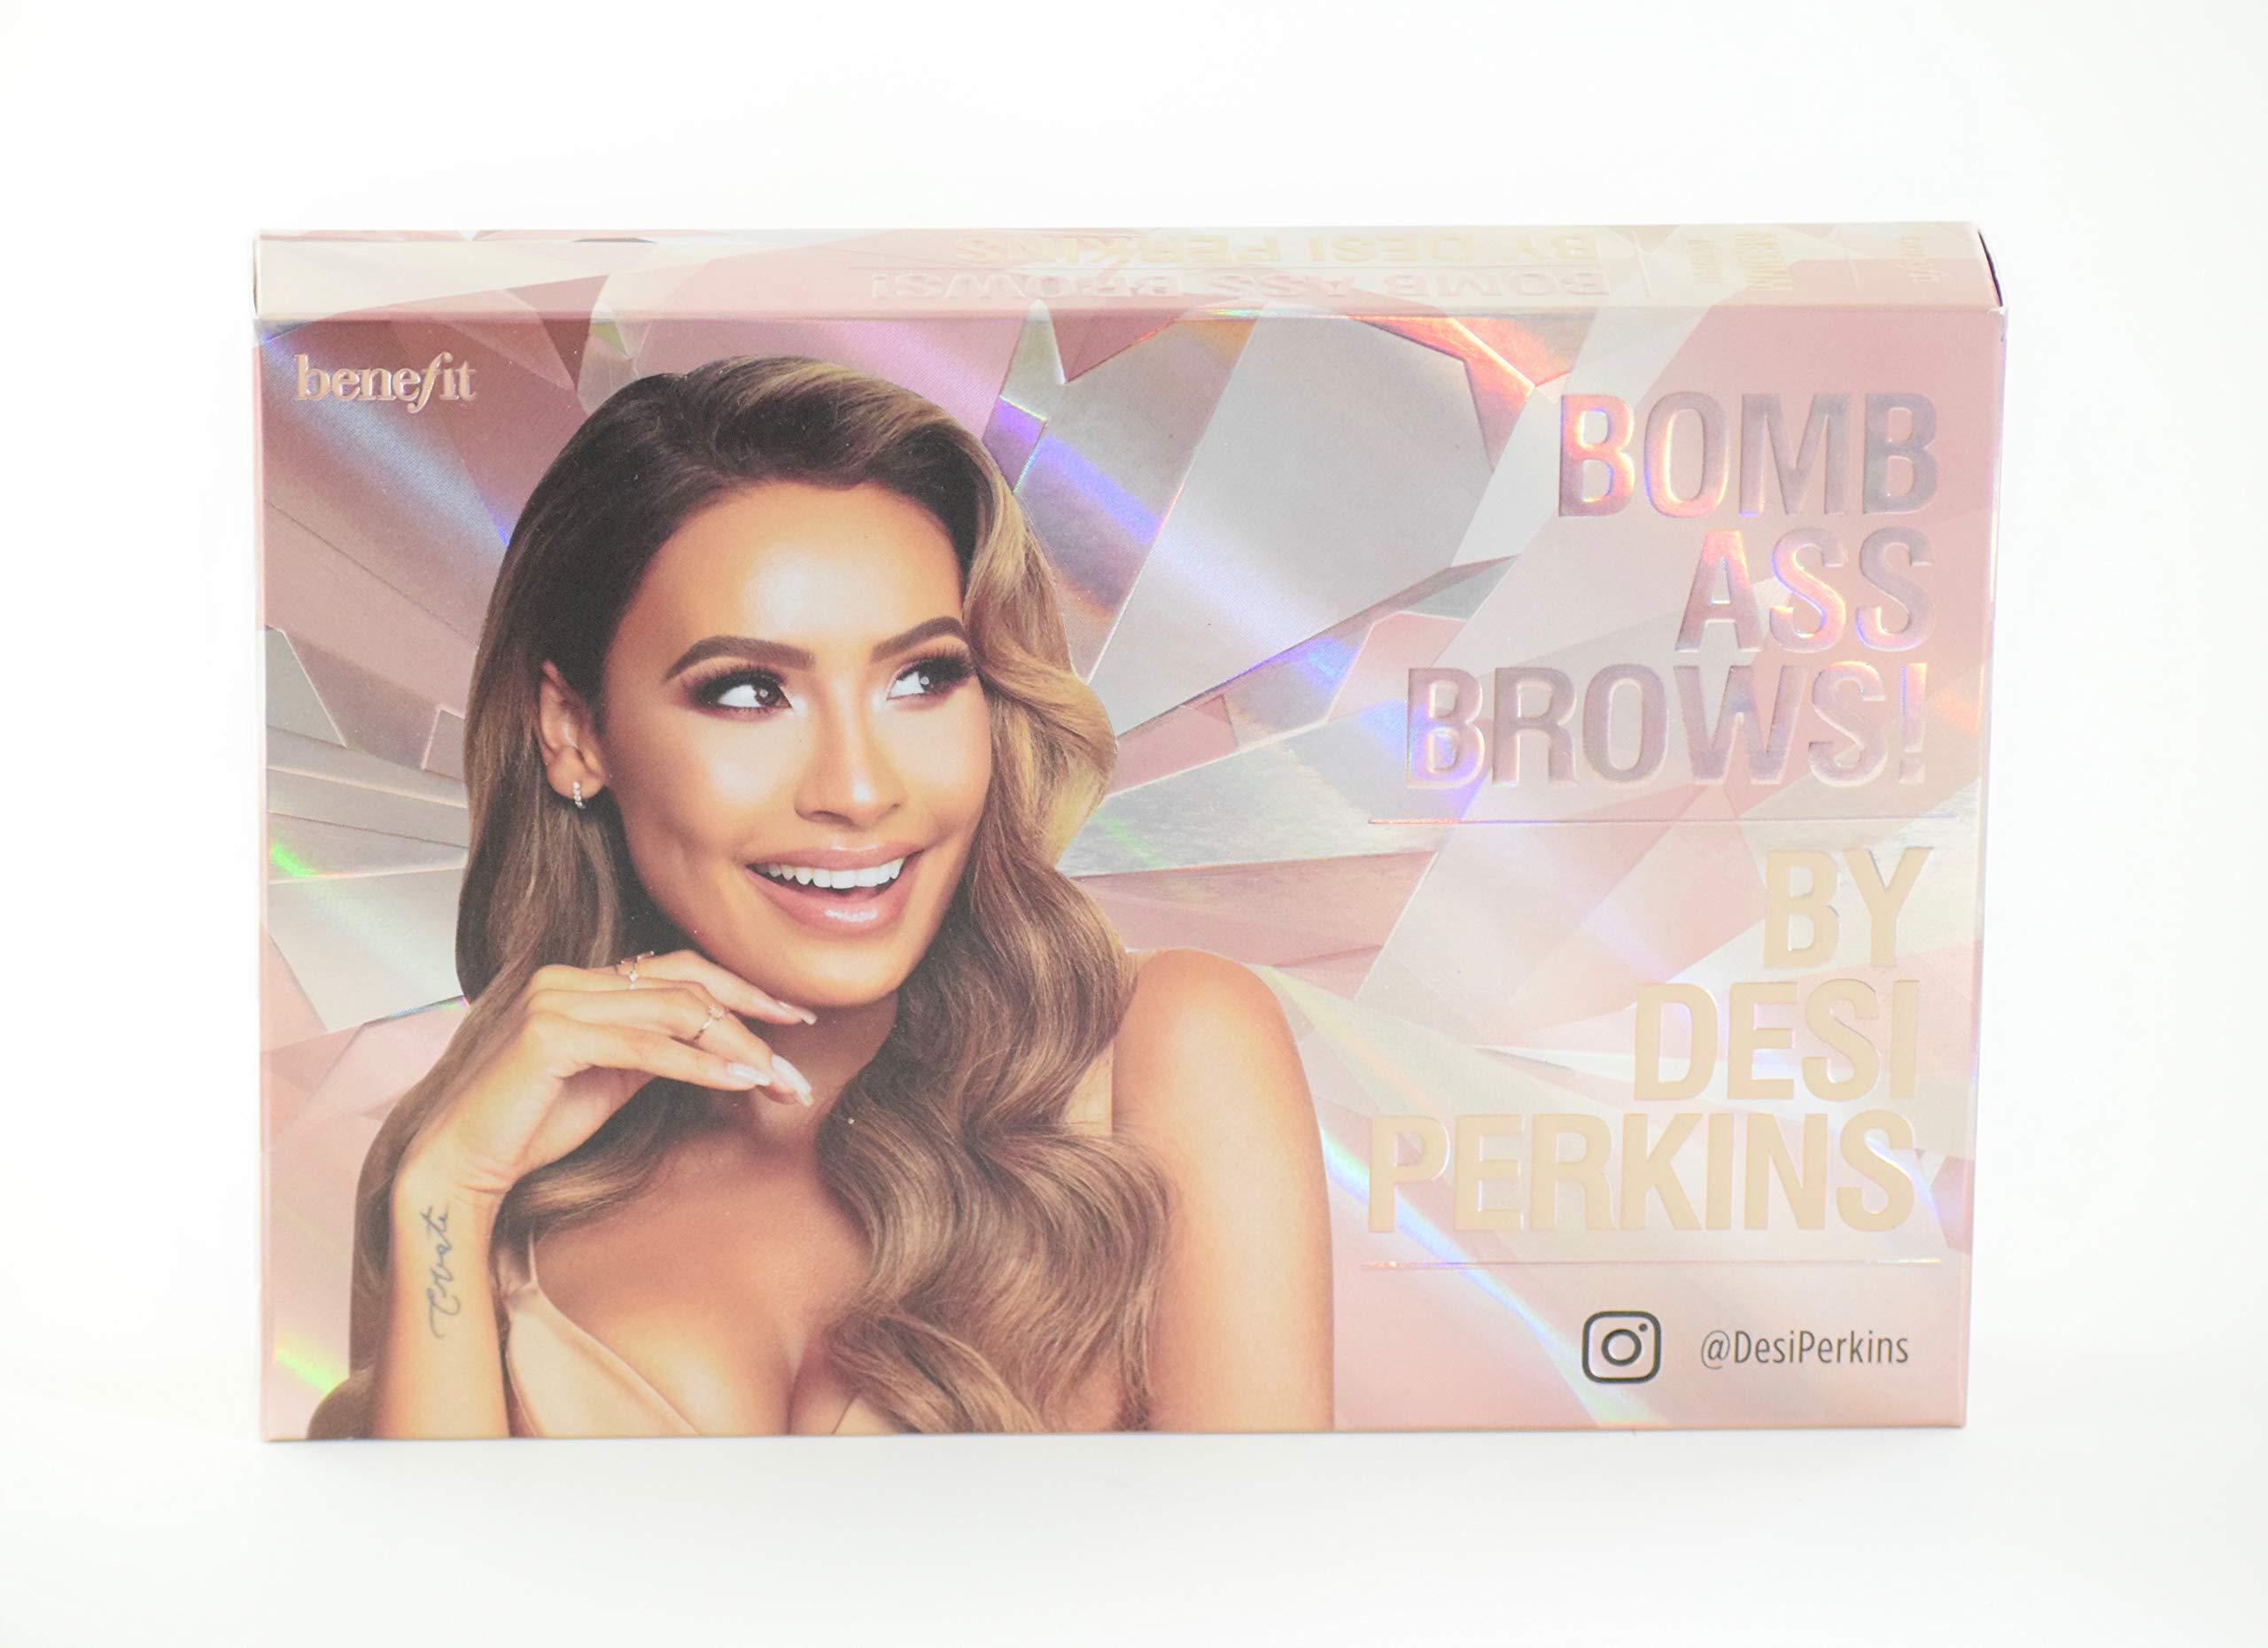 Benefit Desi Perkins Bomb Ass Brows Set - Light by Benefit